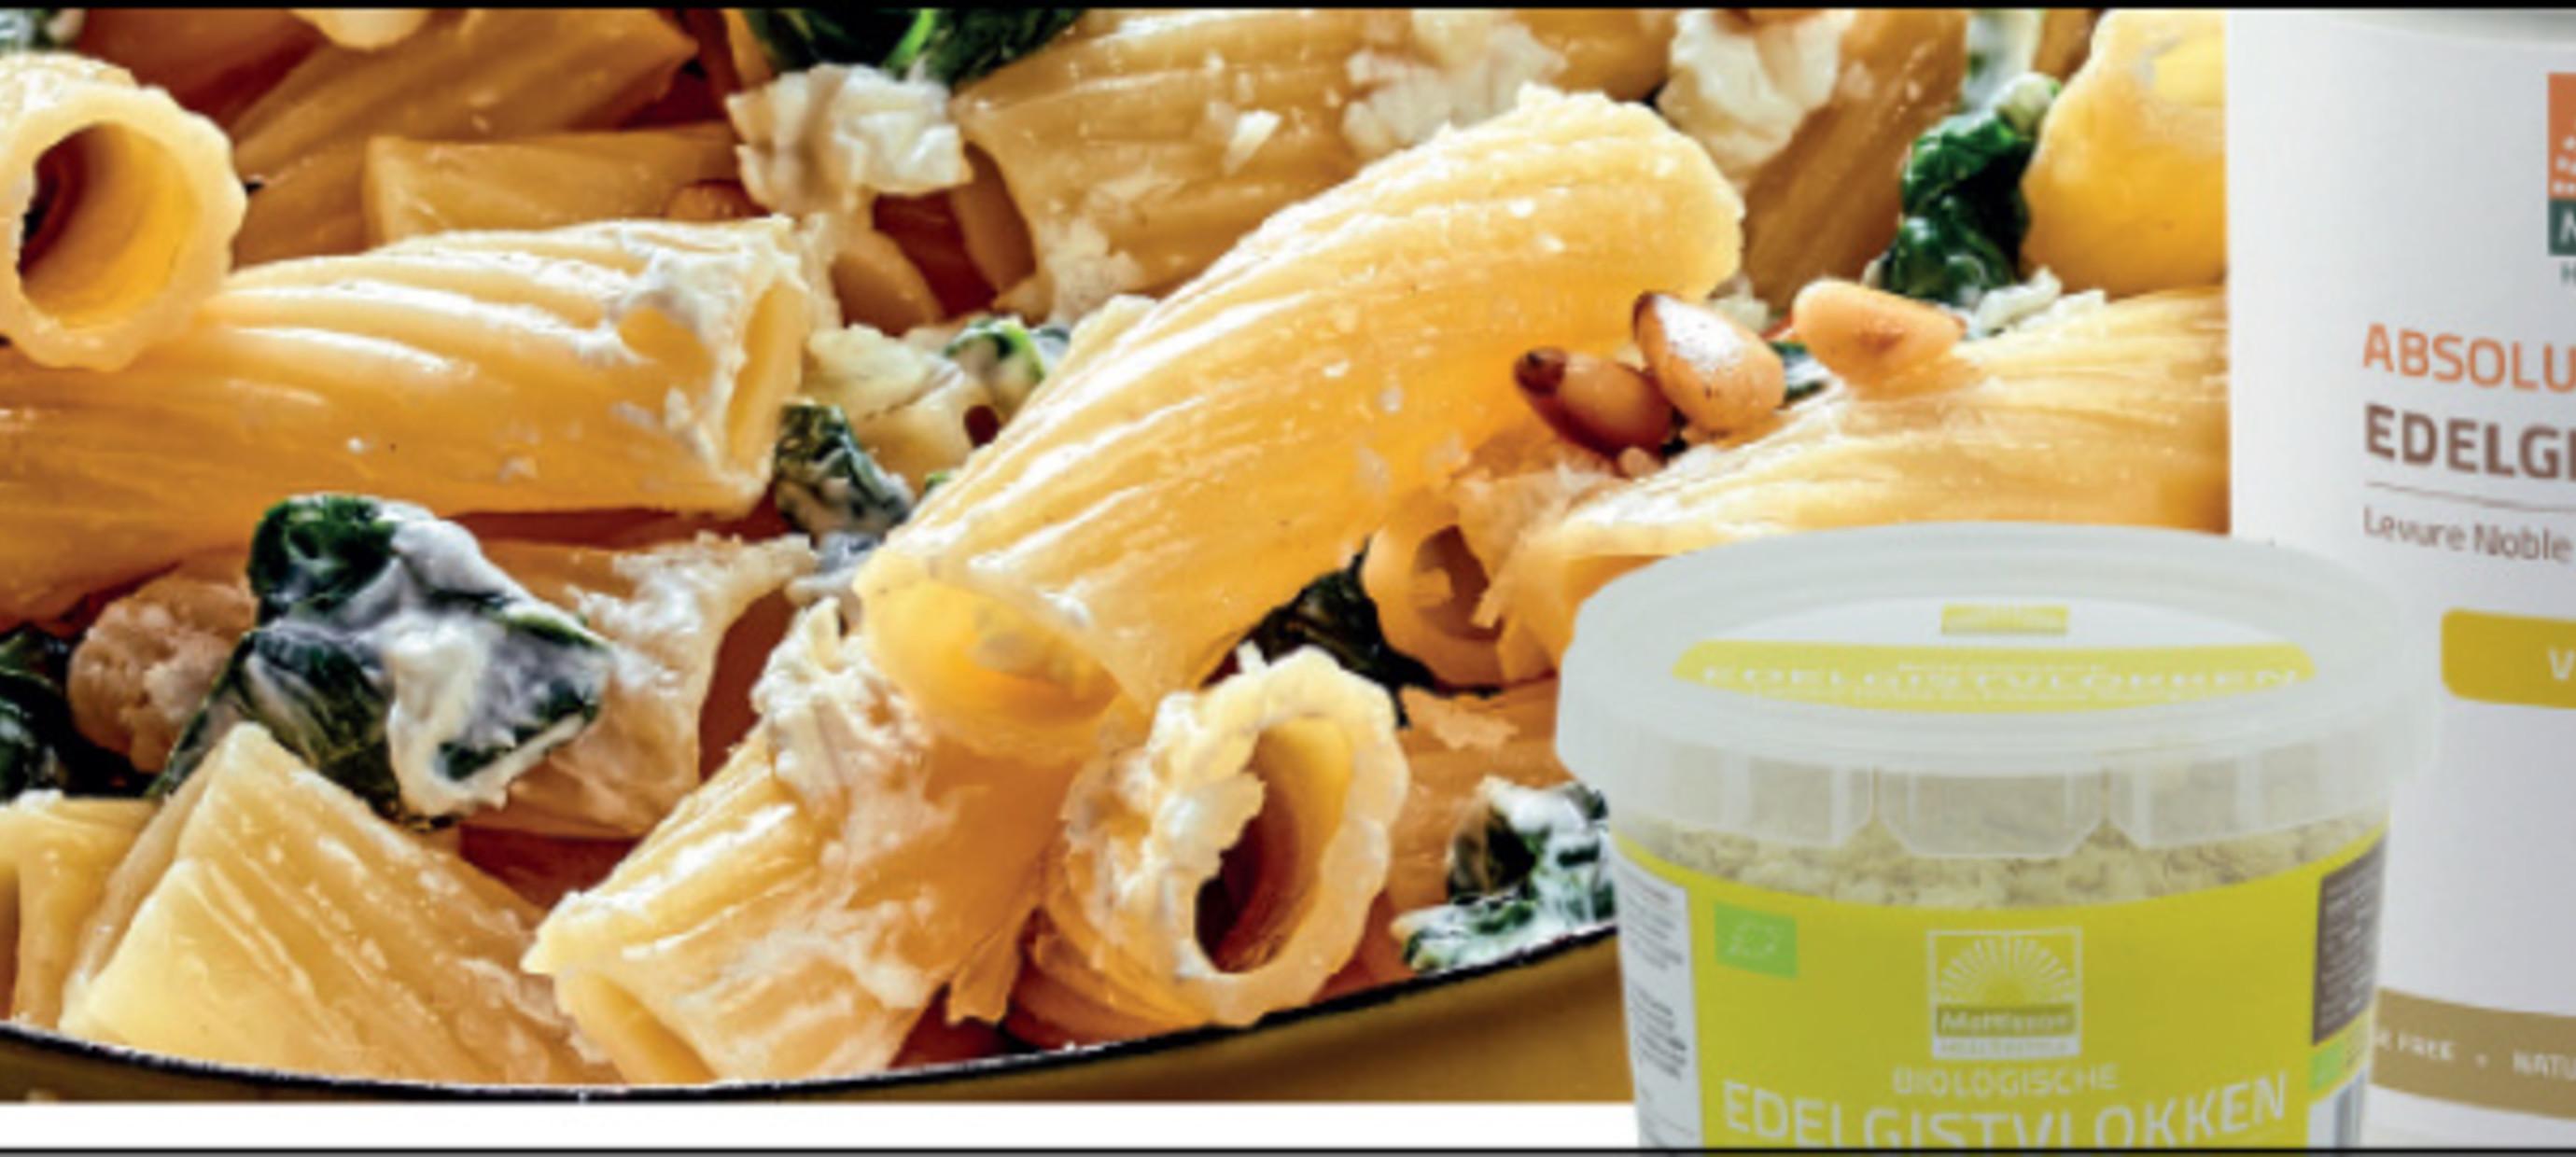 Vegan 'Parmezaanse Kaas' maken van Edelgistvlokken